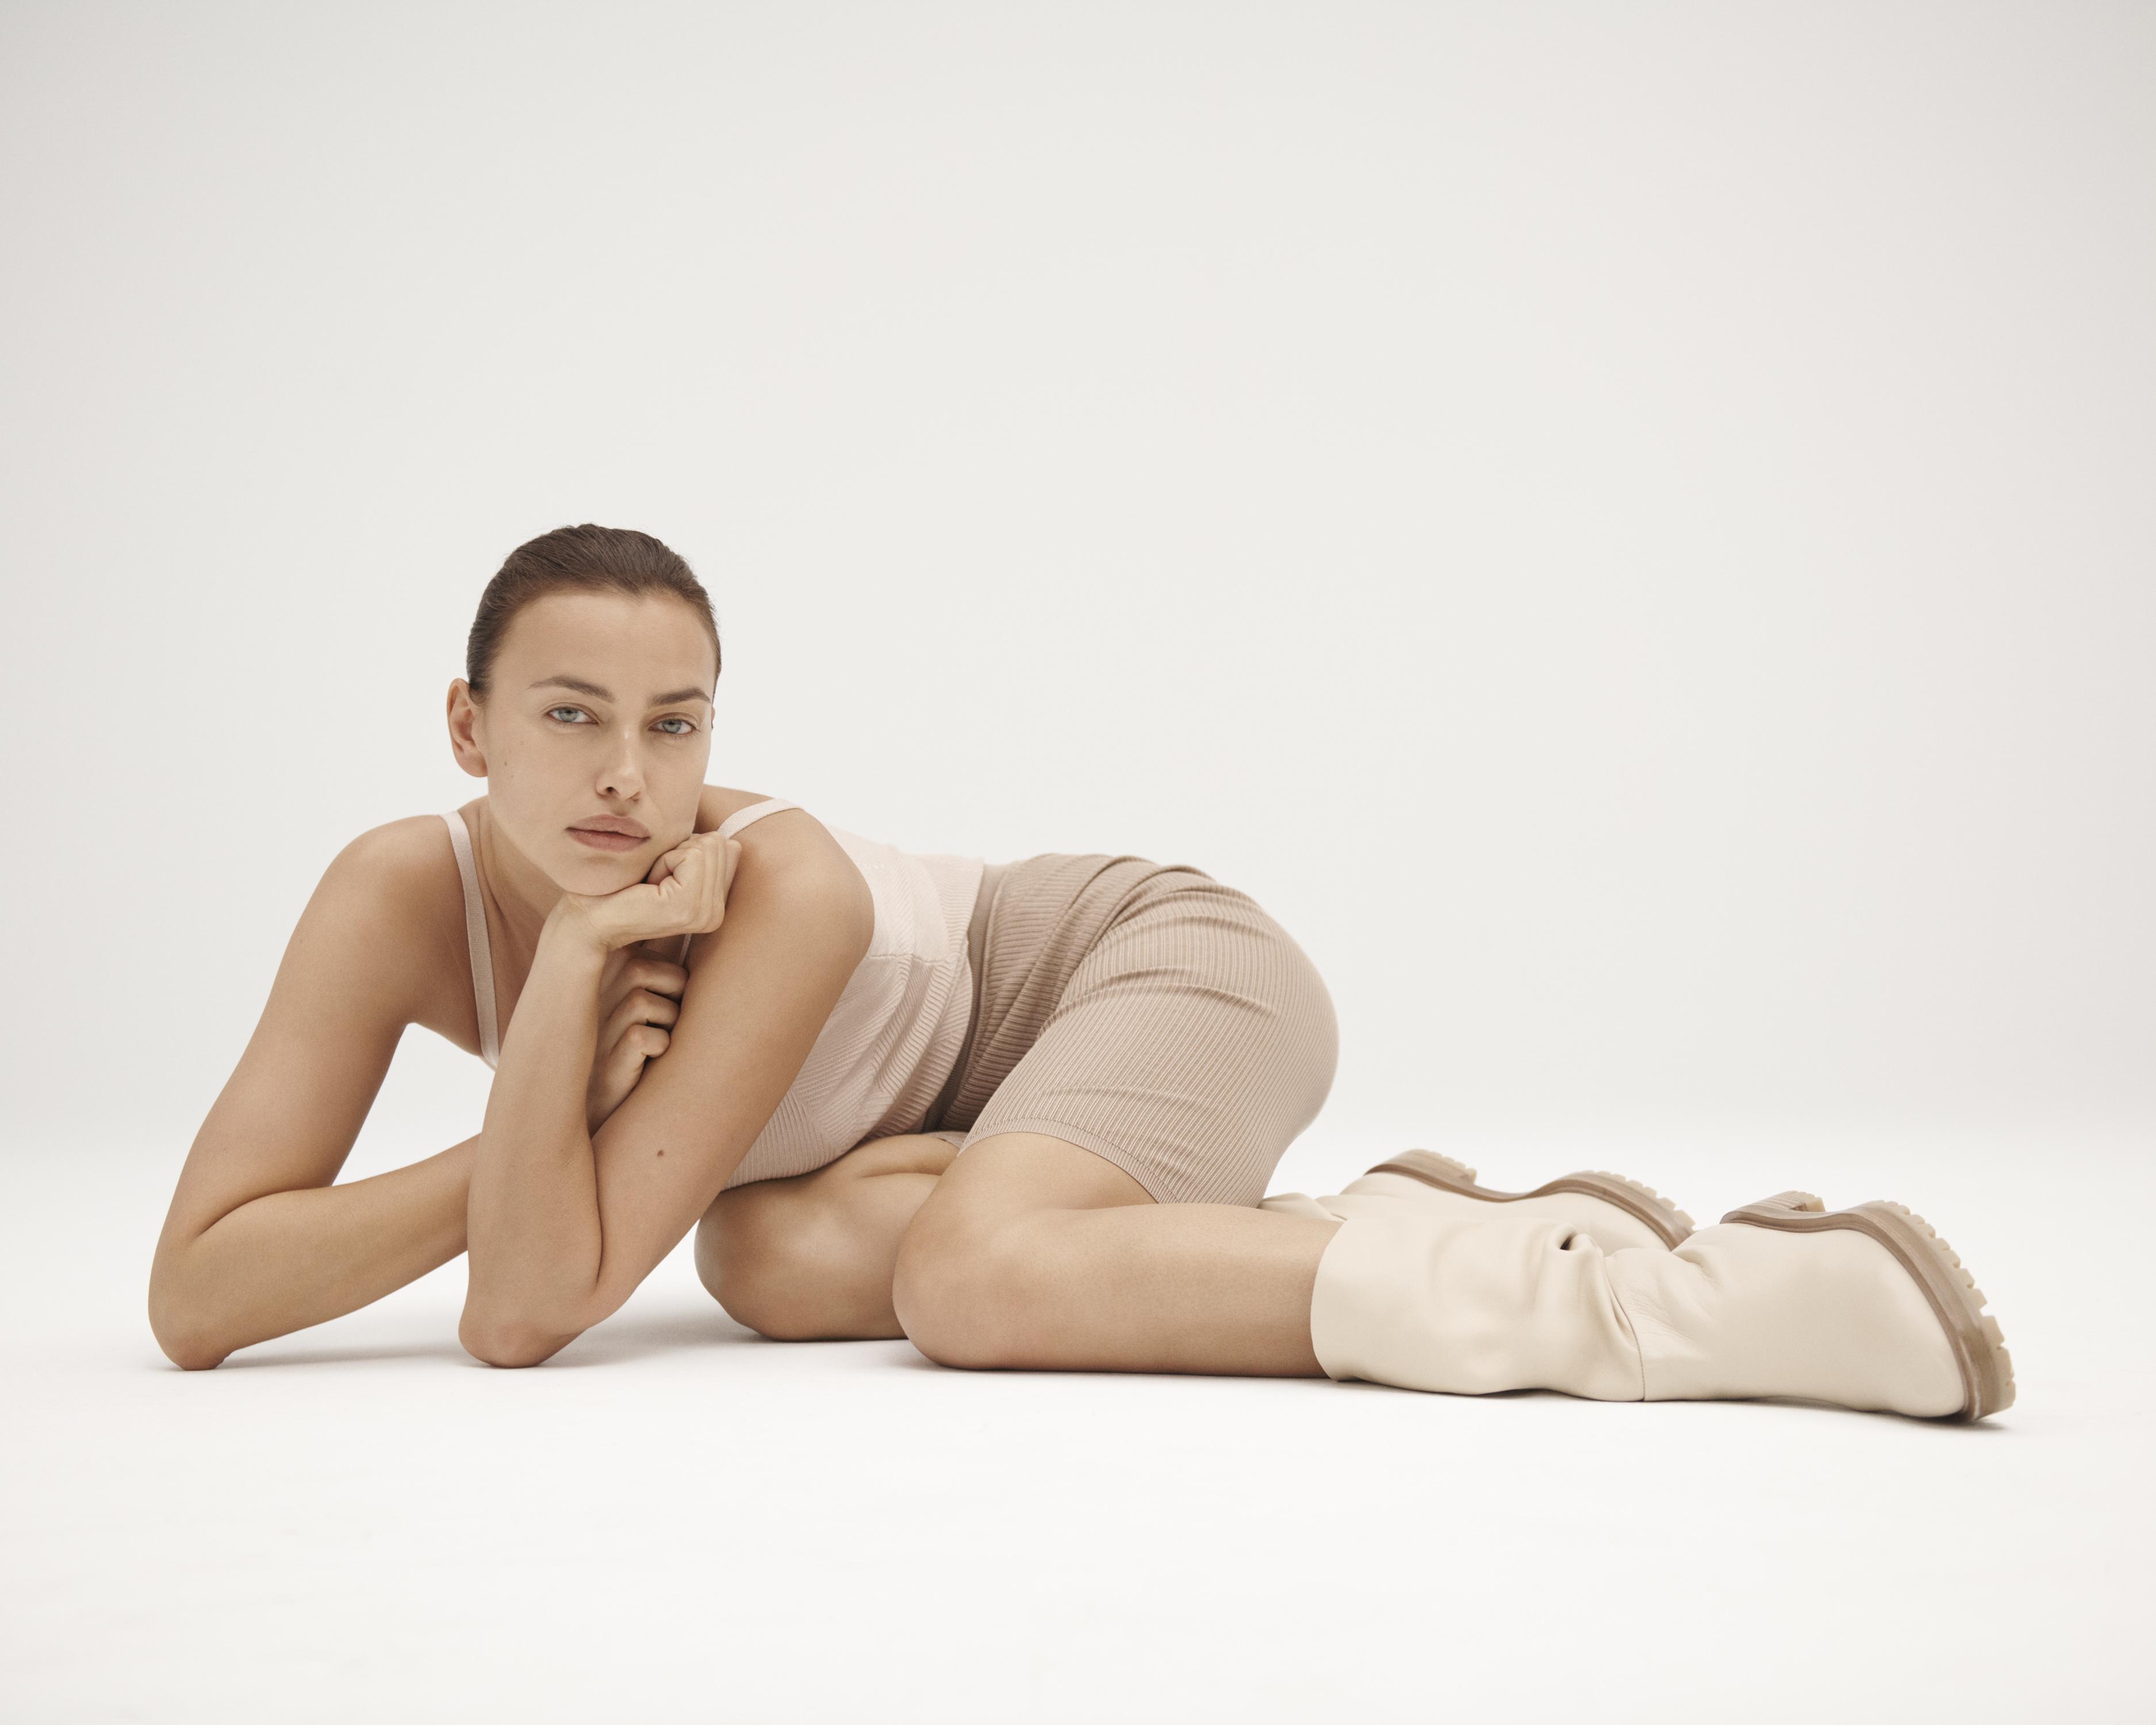 A campaign image from the Tamara Mellon x Irina Shayk collaboration.